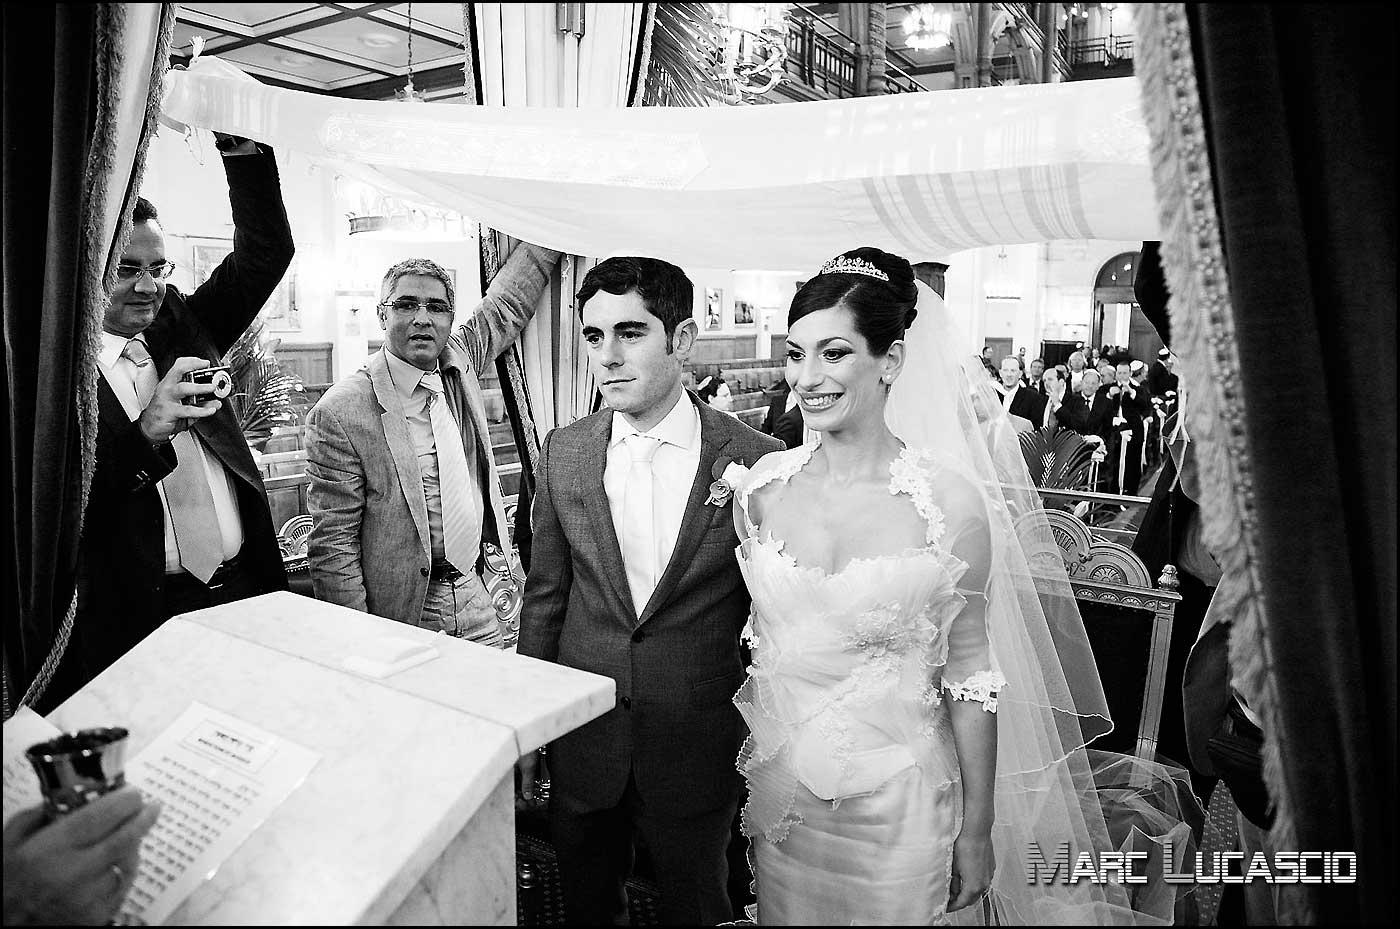 Birkat ha-iroussin mariage juif